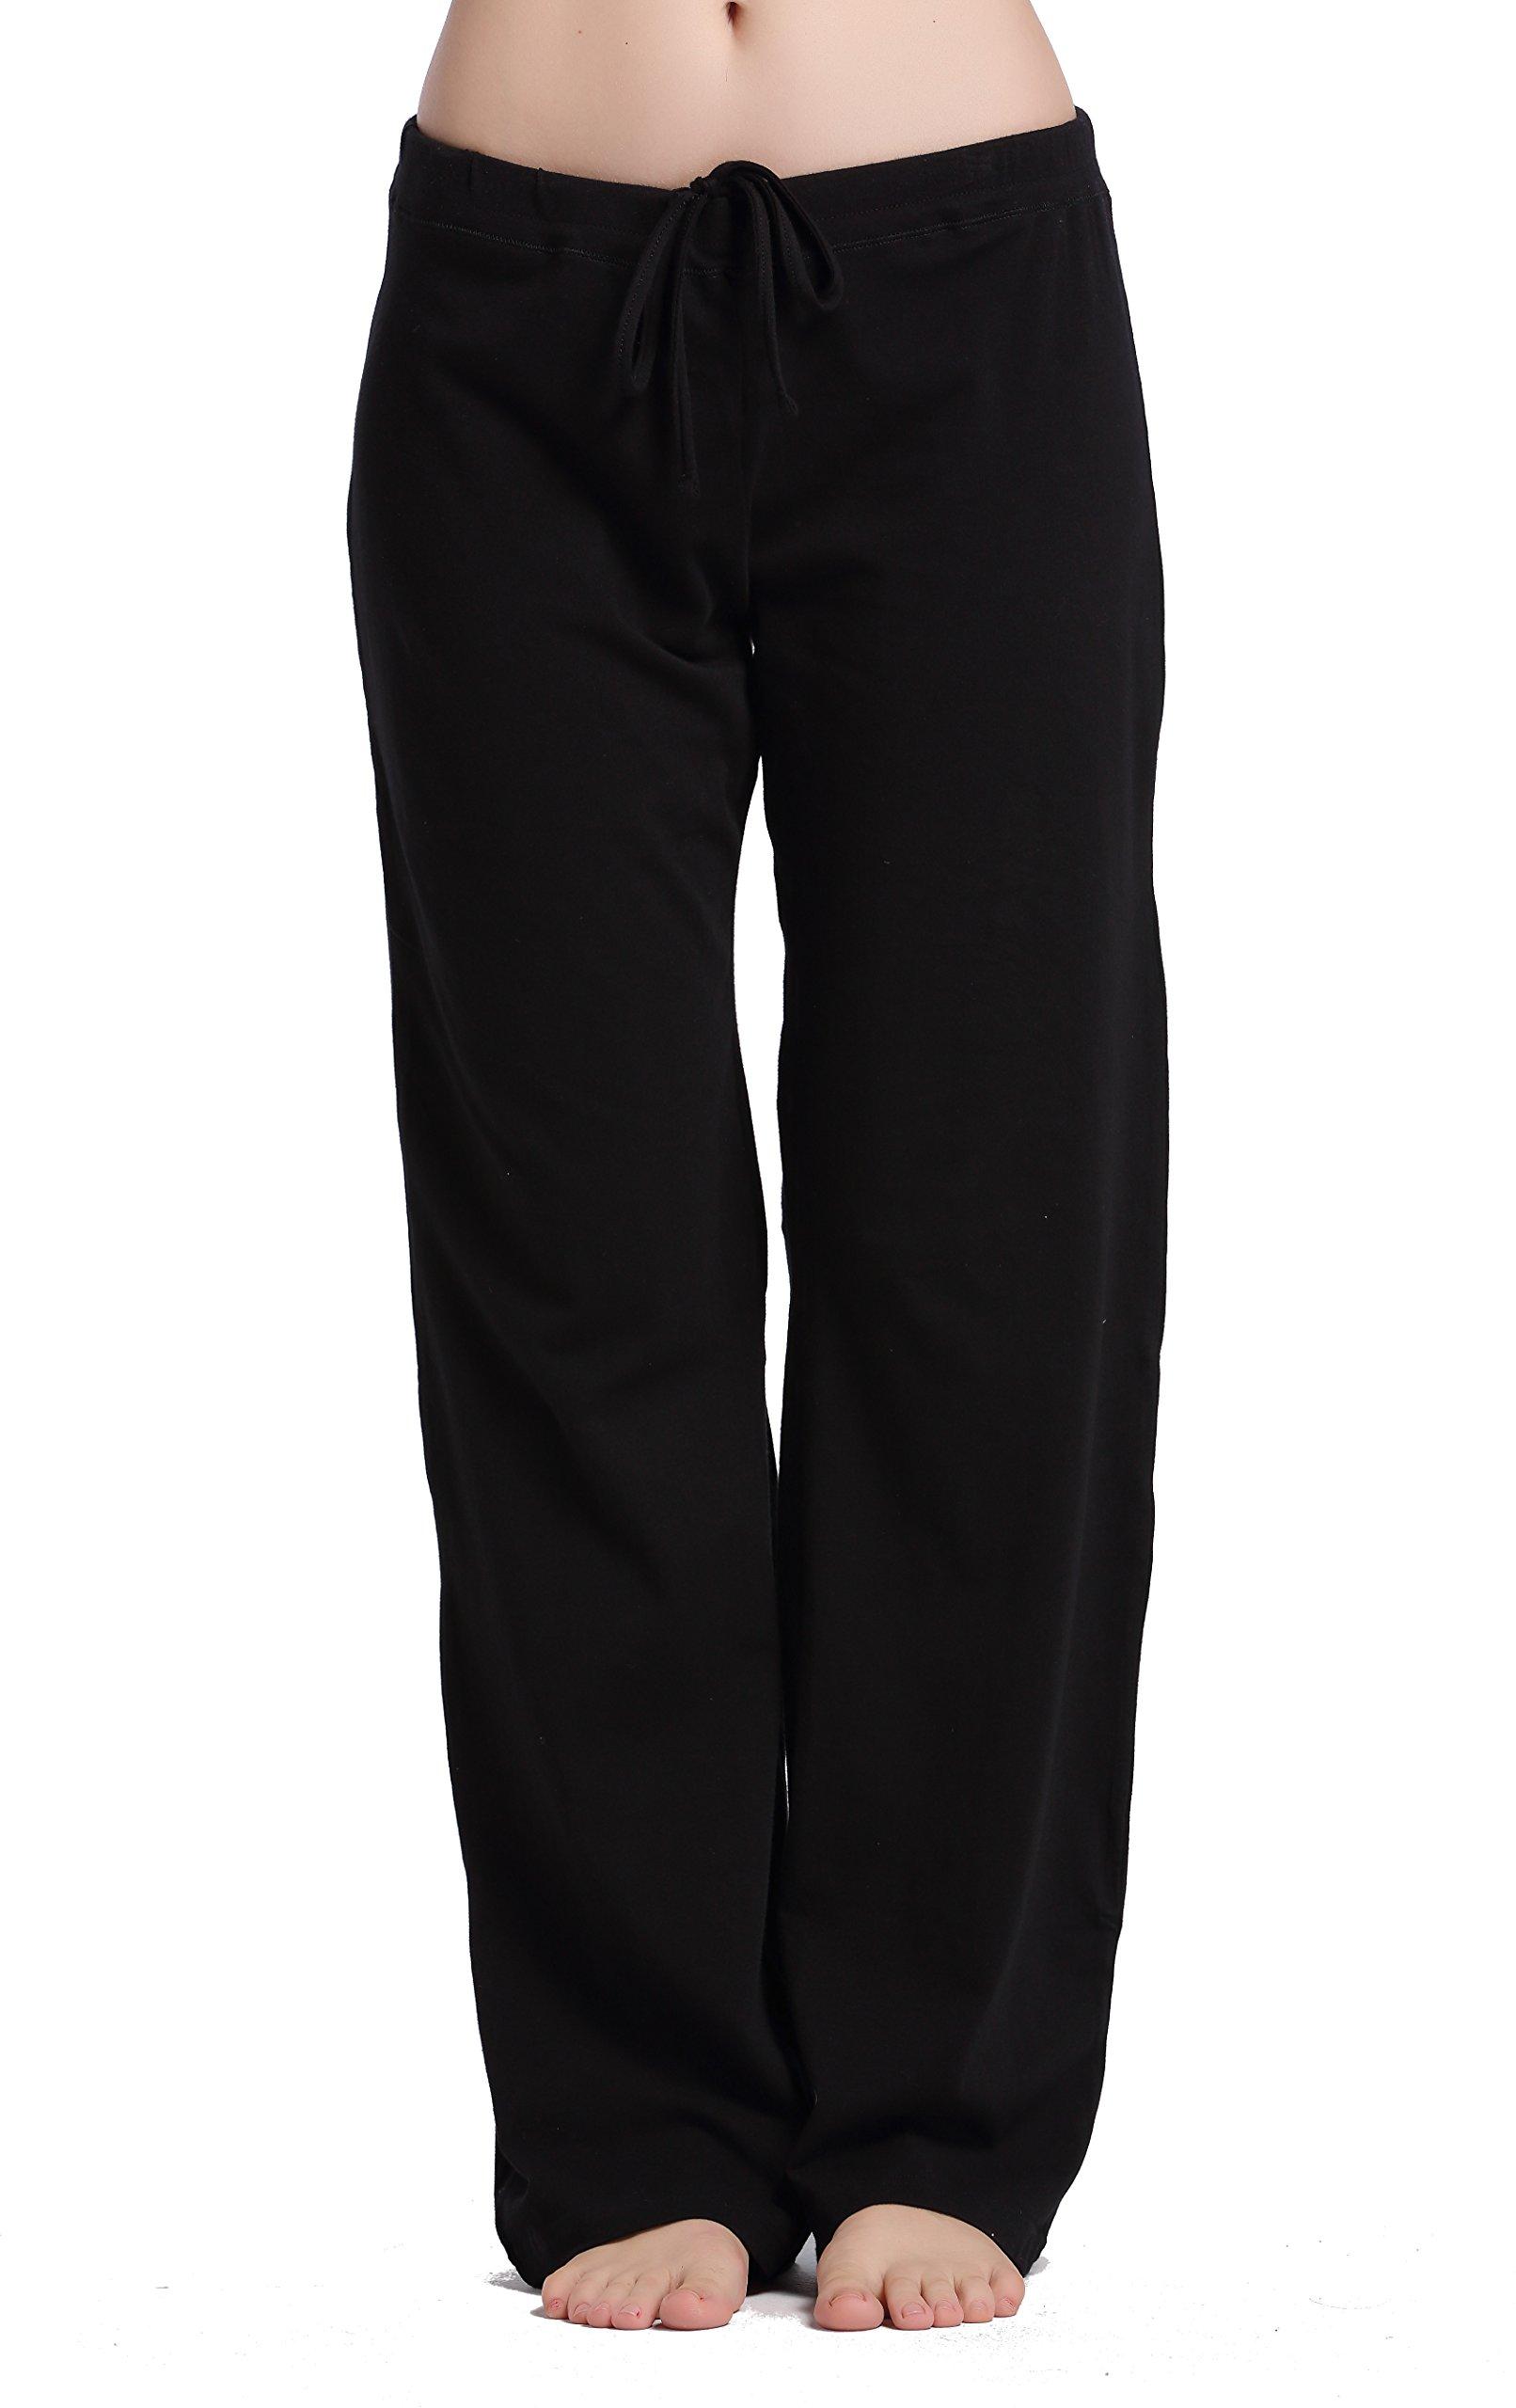 CYZ Women's Basic Stretch Cotton Knit Pajama Sleep Lounge Pants-Black-XL